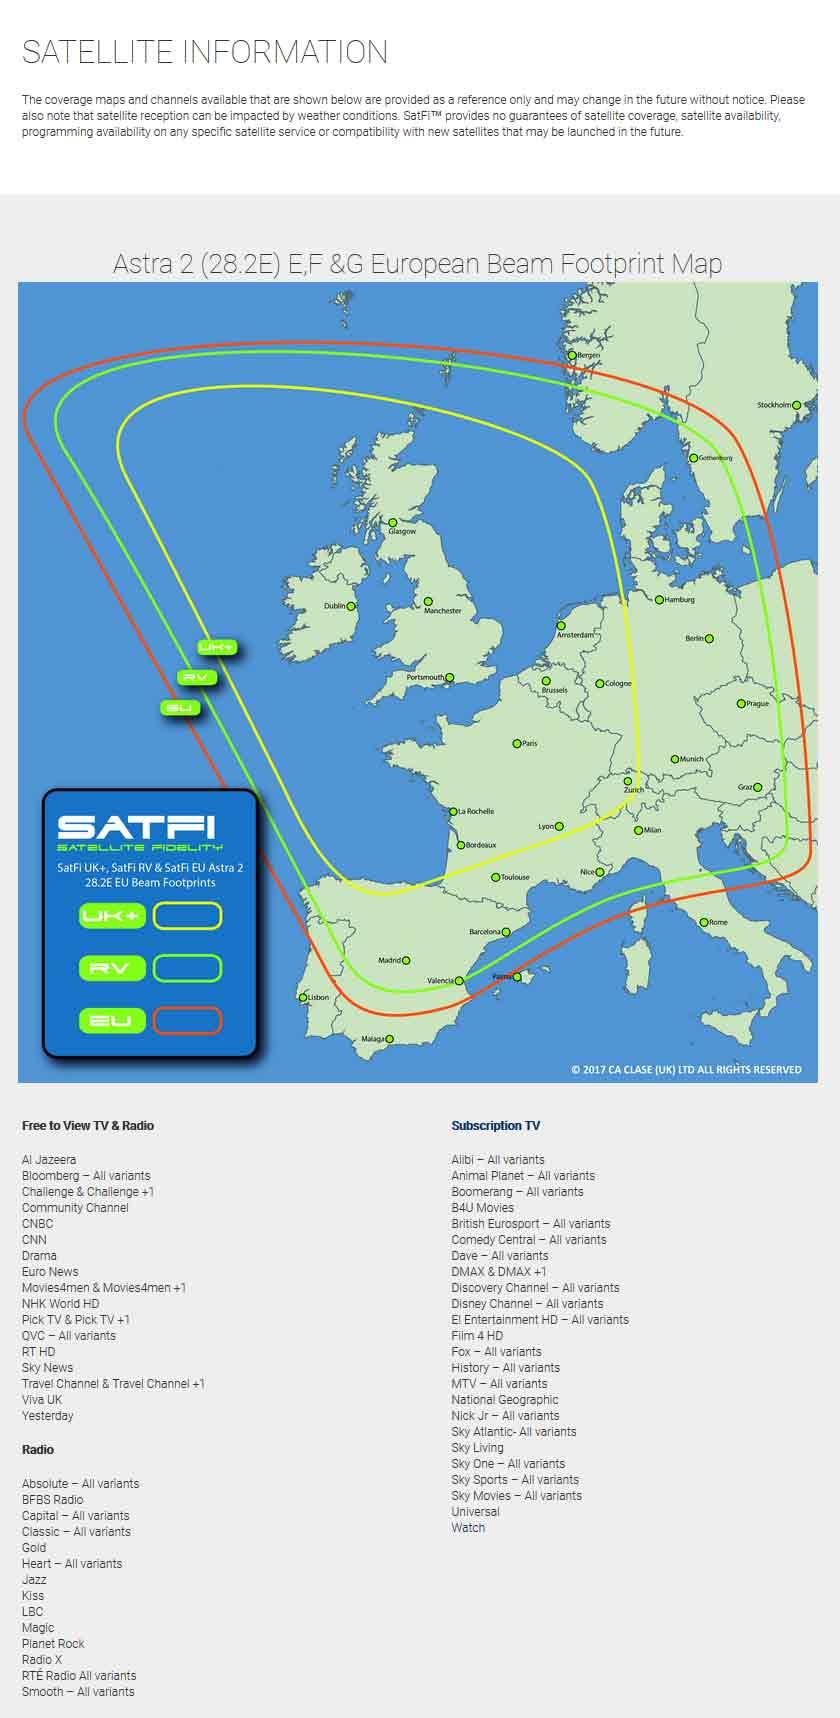 SatFi UK+ Ultra Slimline Static Twin LNB Satellite Dome - 17-03-026-0